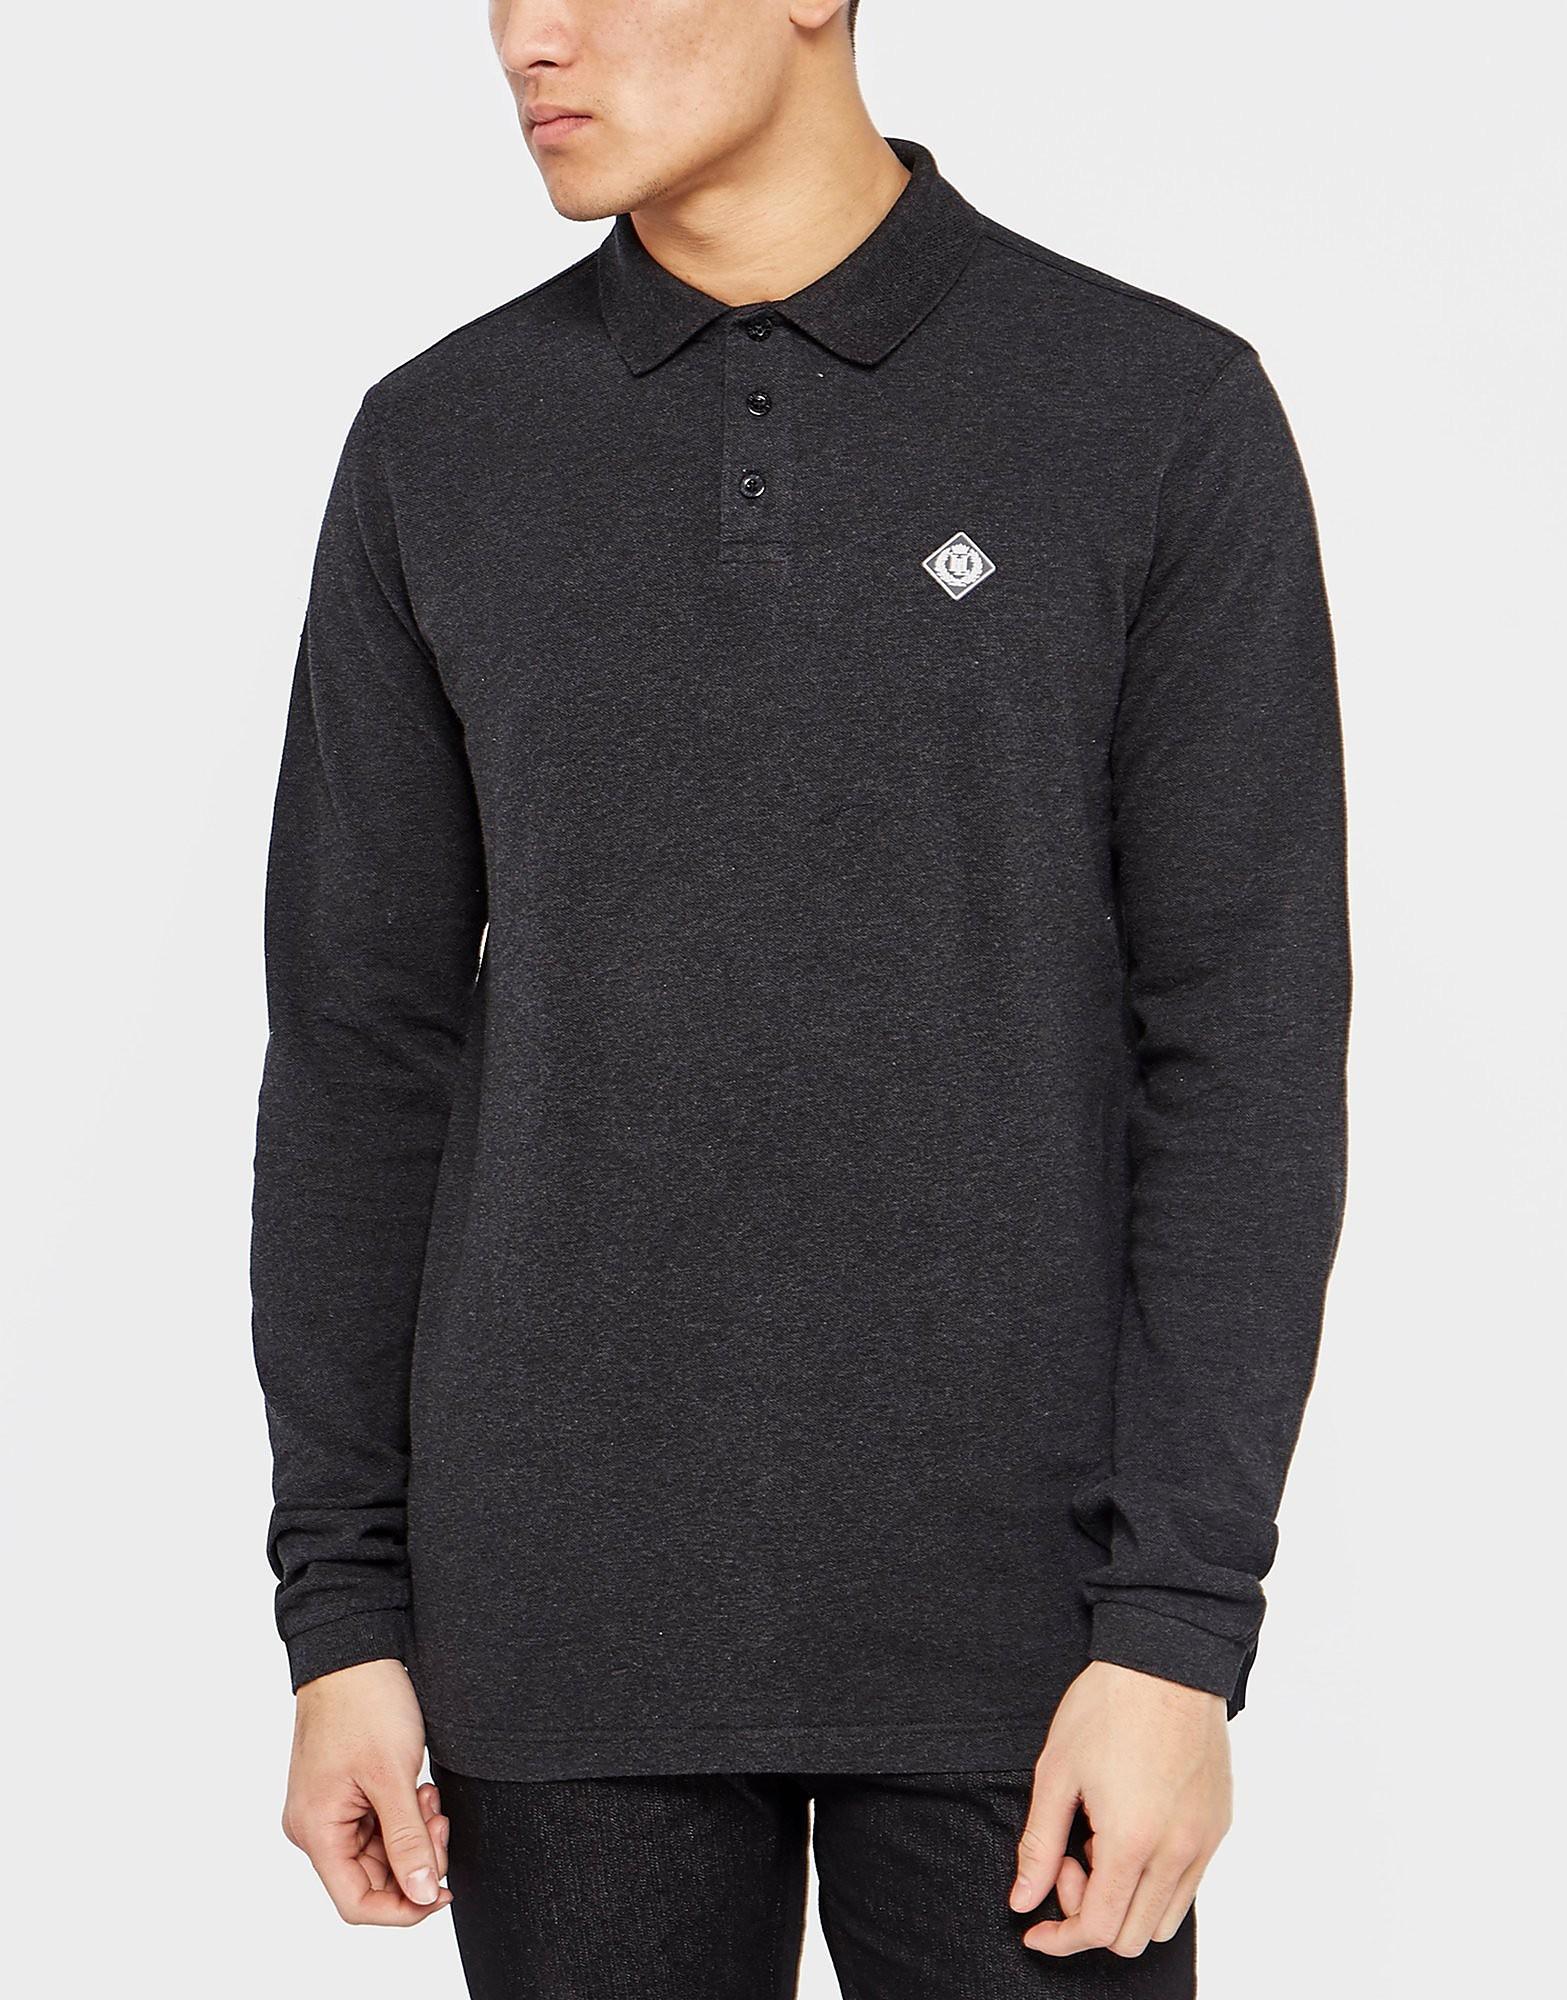 Henri Lloyd Clevis Long Sleeve Polo Shirt